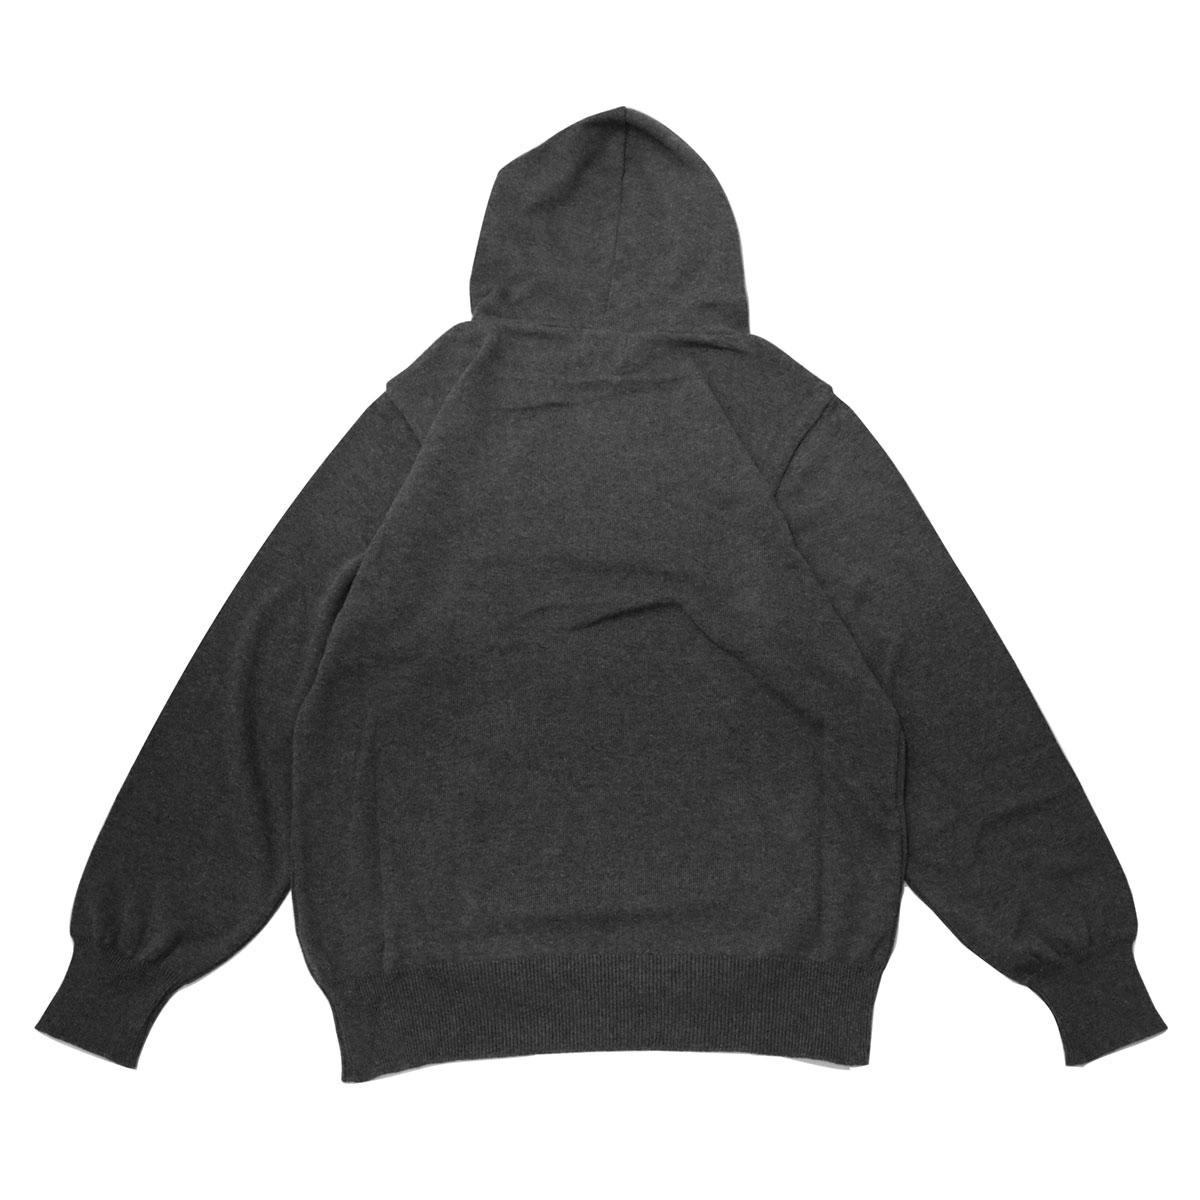 B!nn Knit Hoodie (Gray)